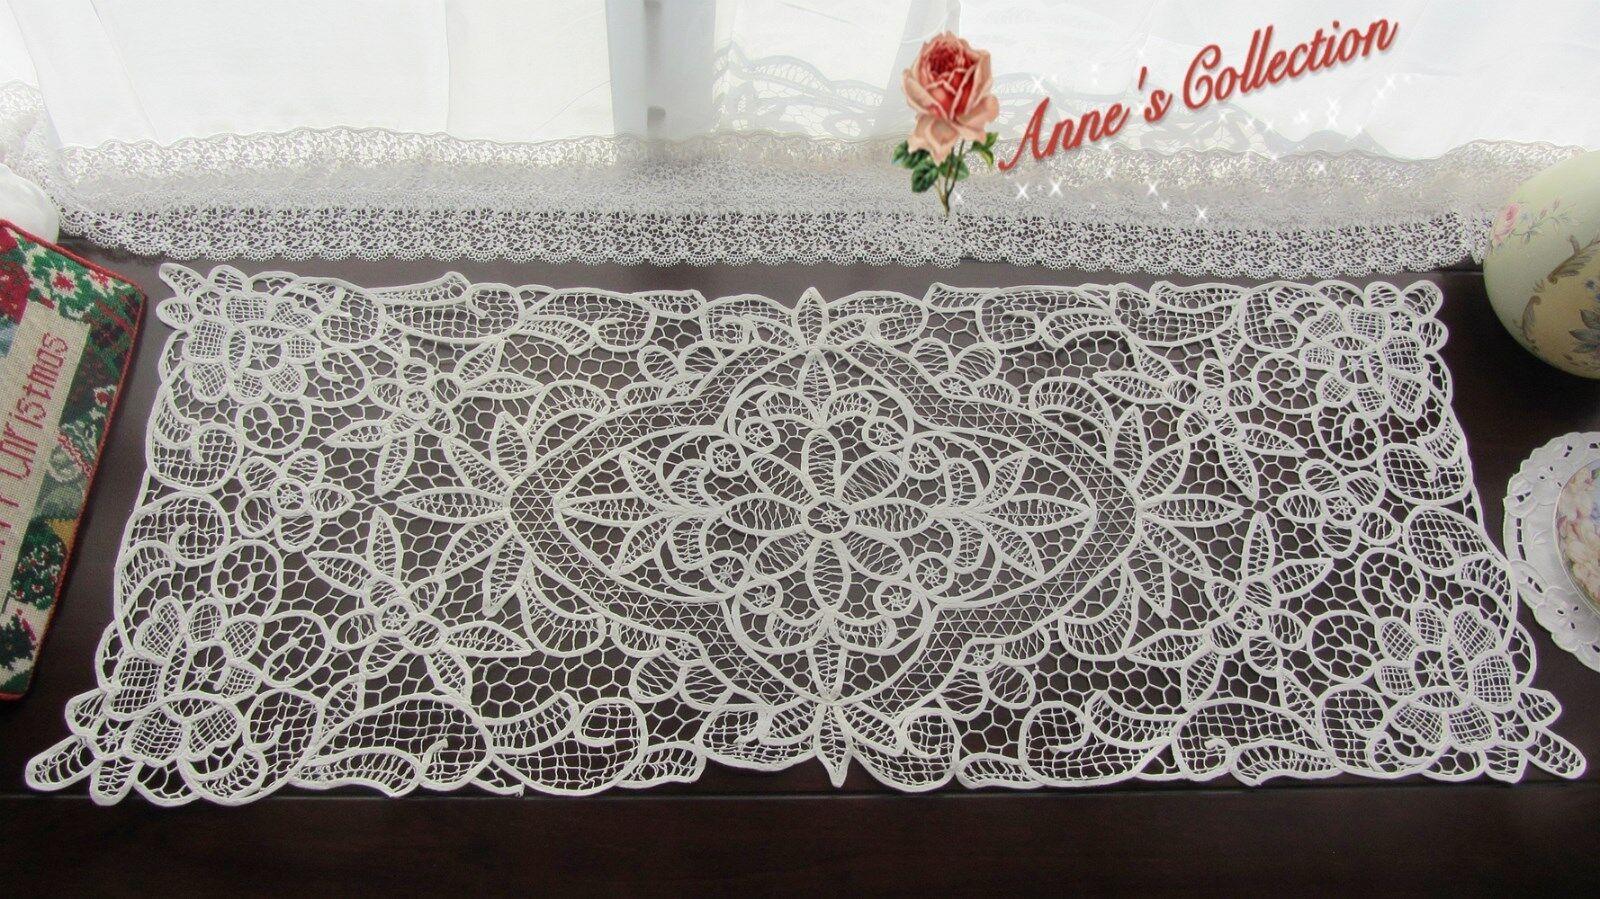 12PCS beau replongé Lace Table Runner commode  Blanc  Coton  ROSE & DAISY